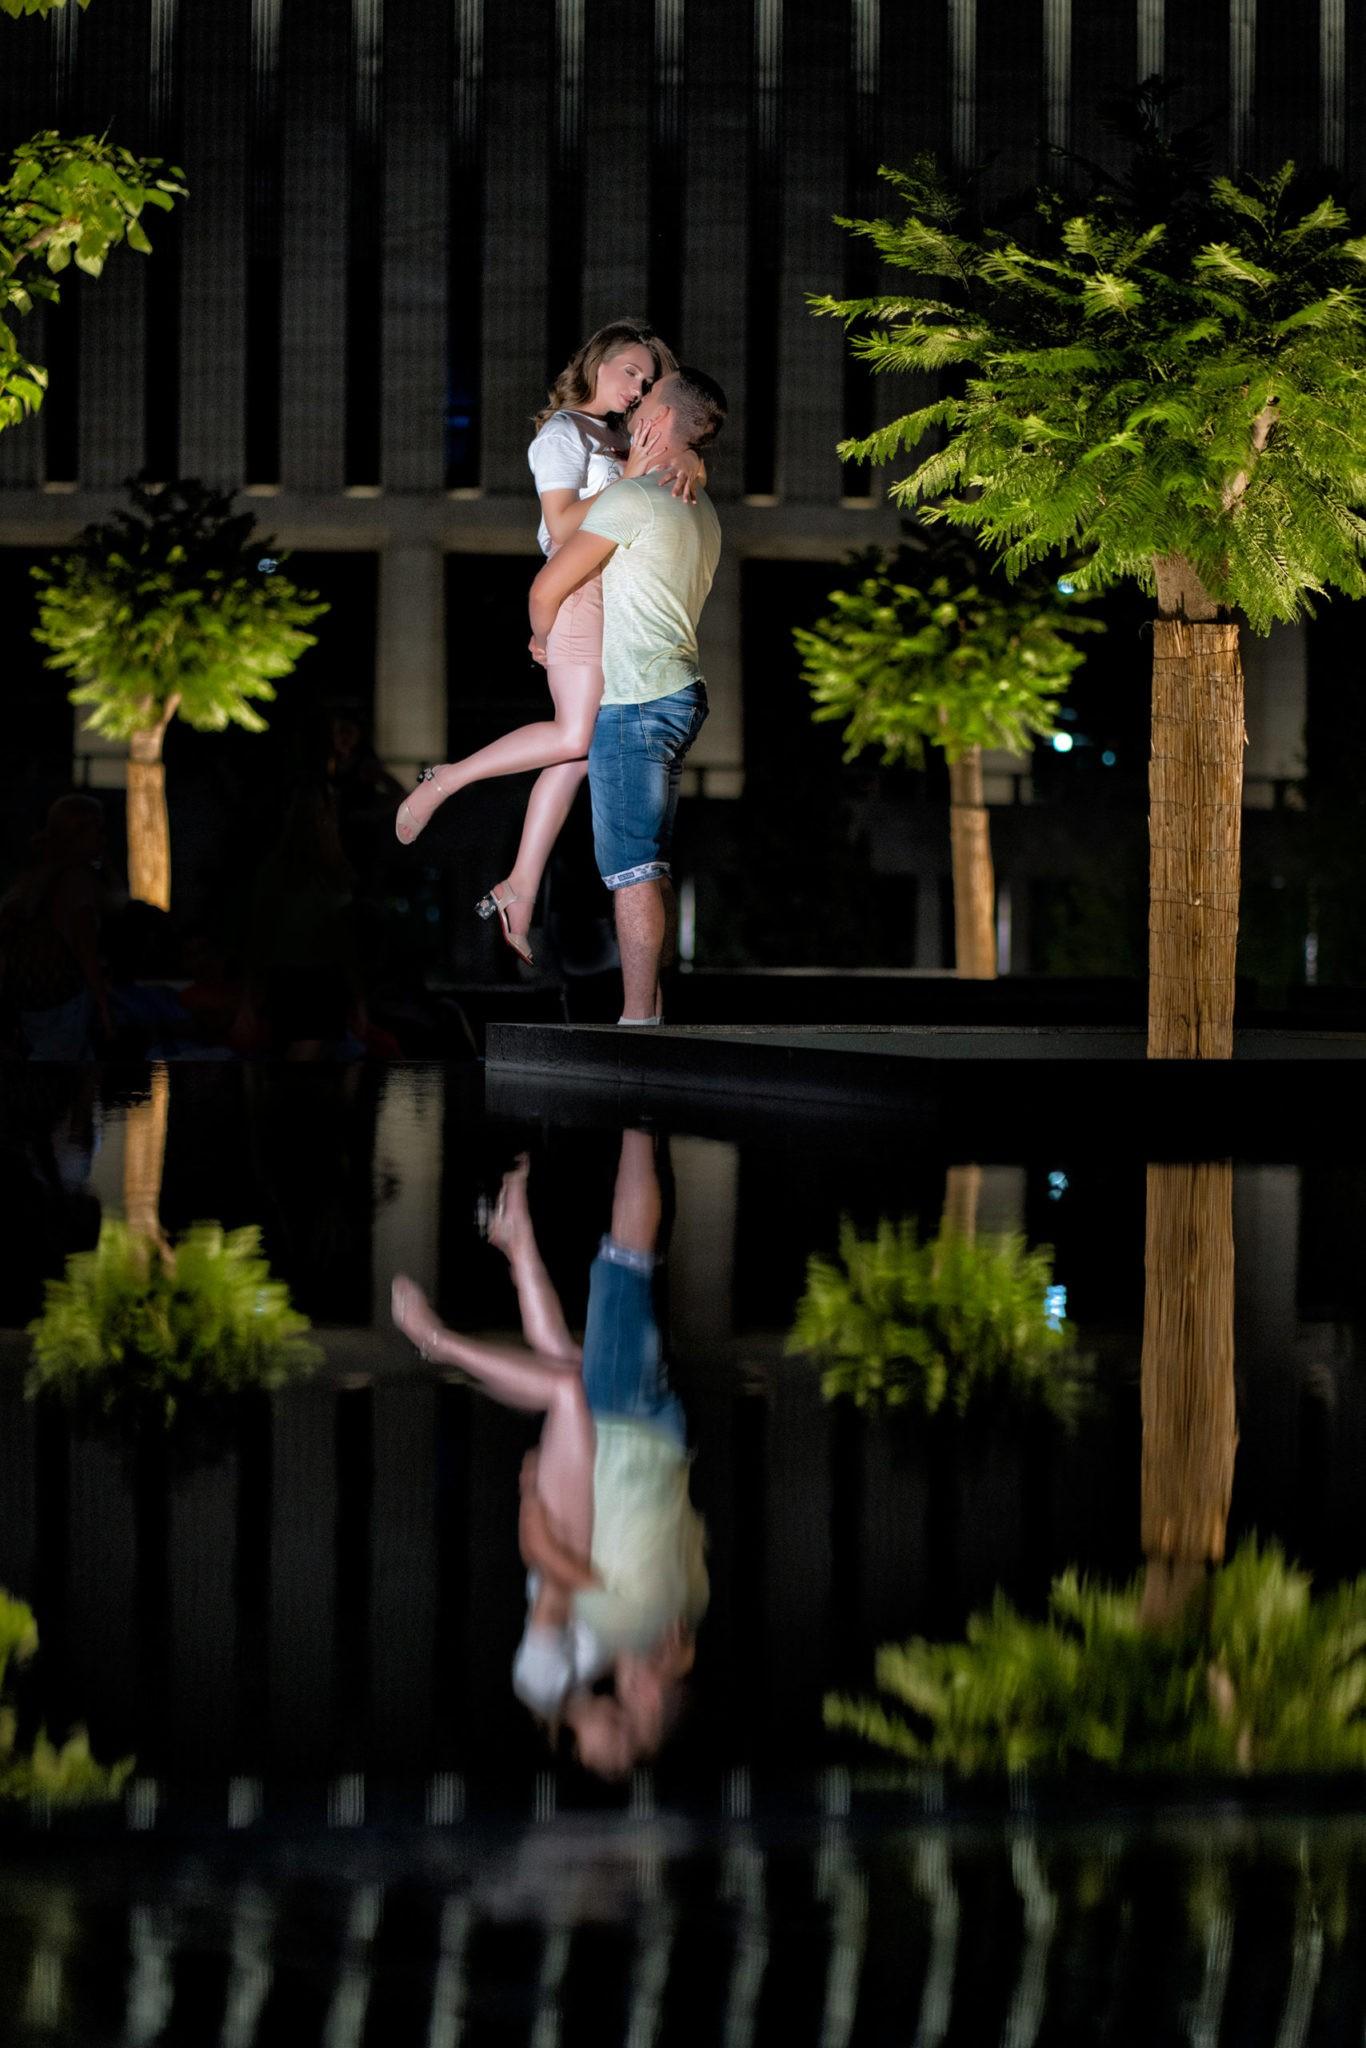 Предсвадебная фотосъемка от свадебного фотографа Love story в в парке Галицкого